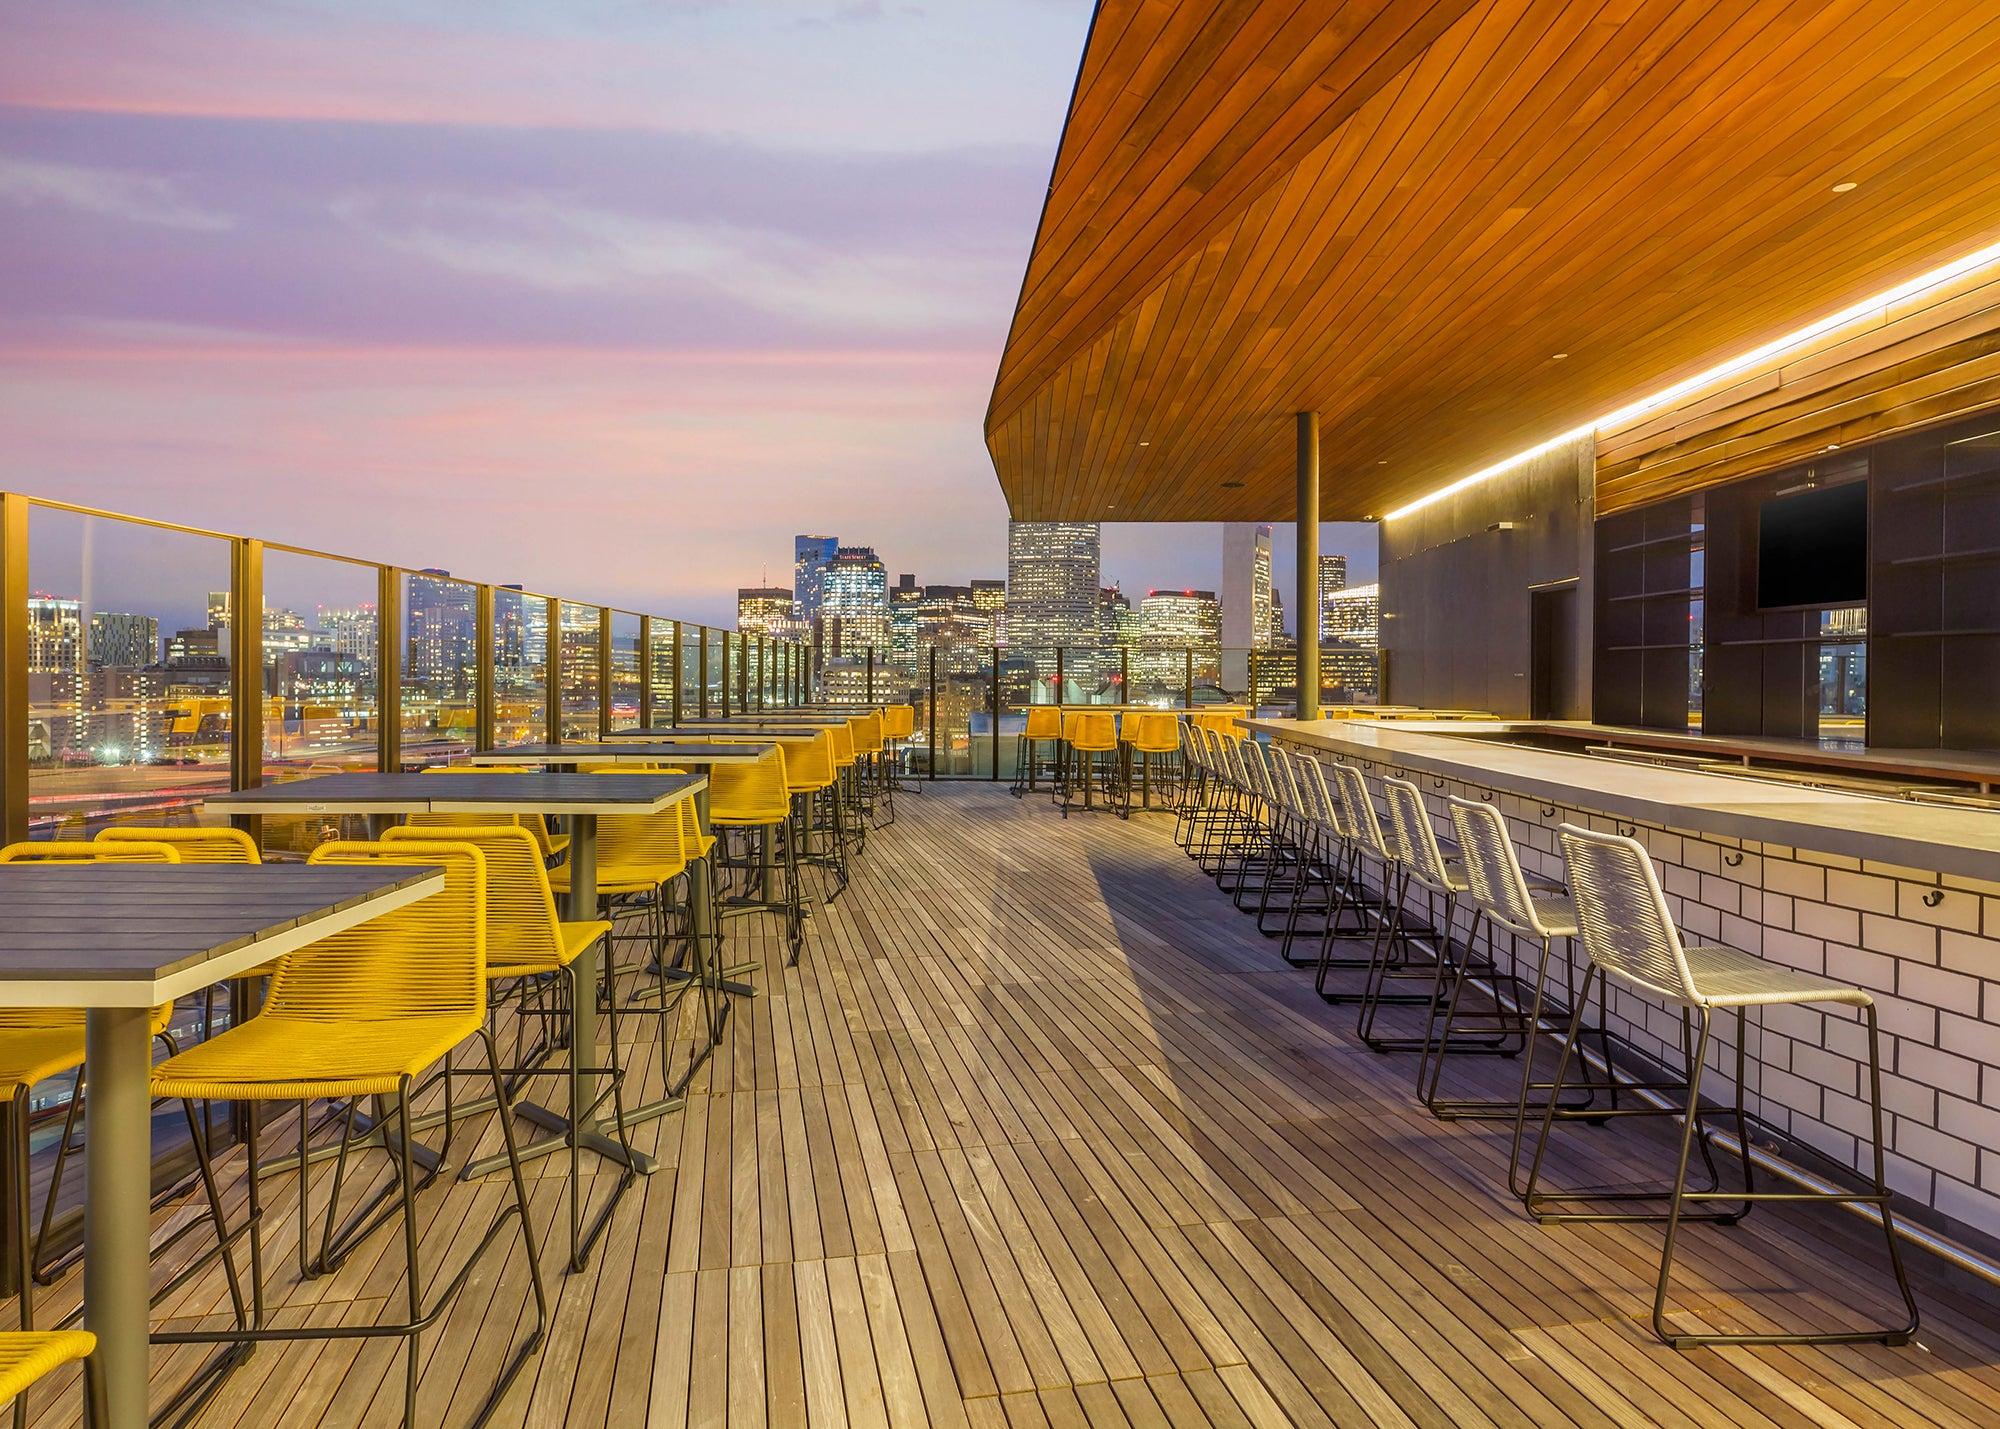 Six West rooftop bar